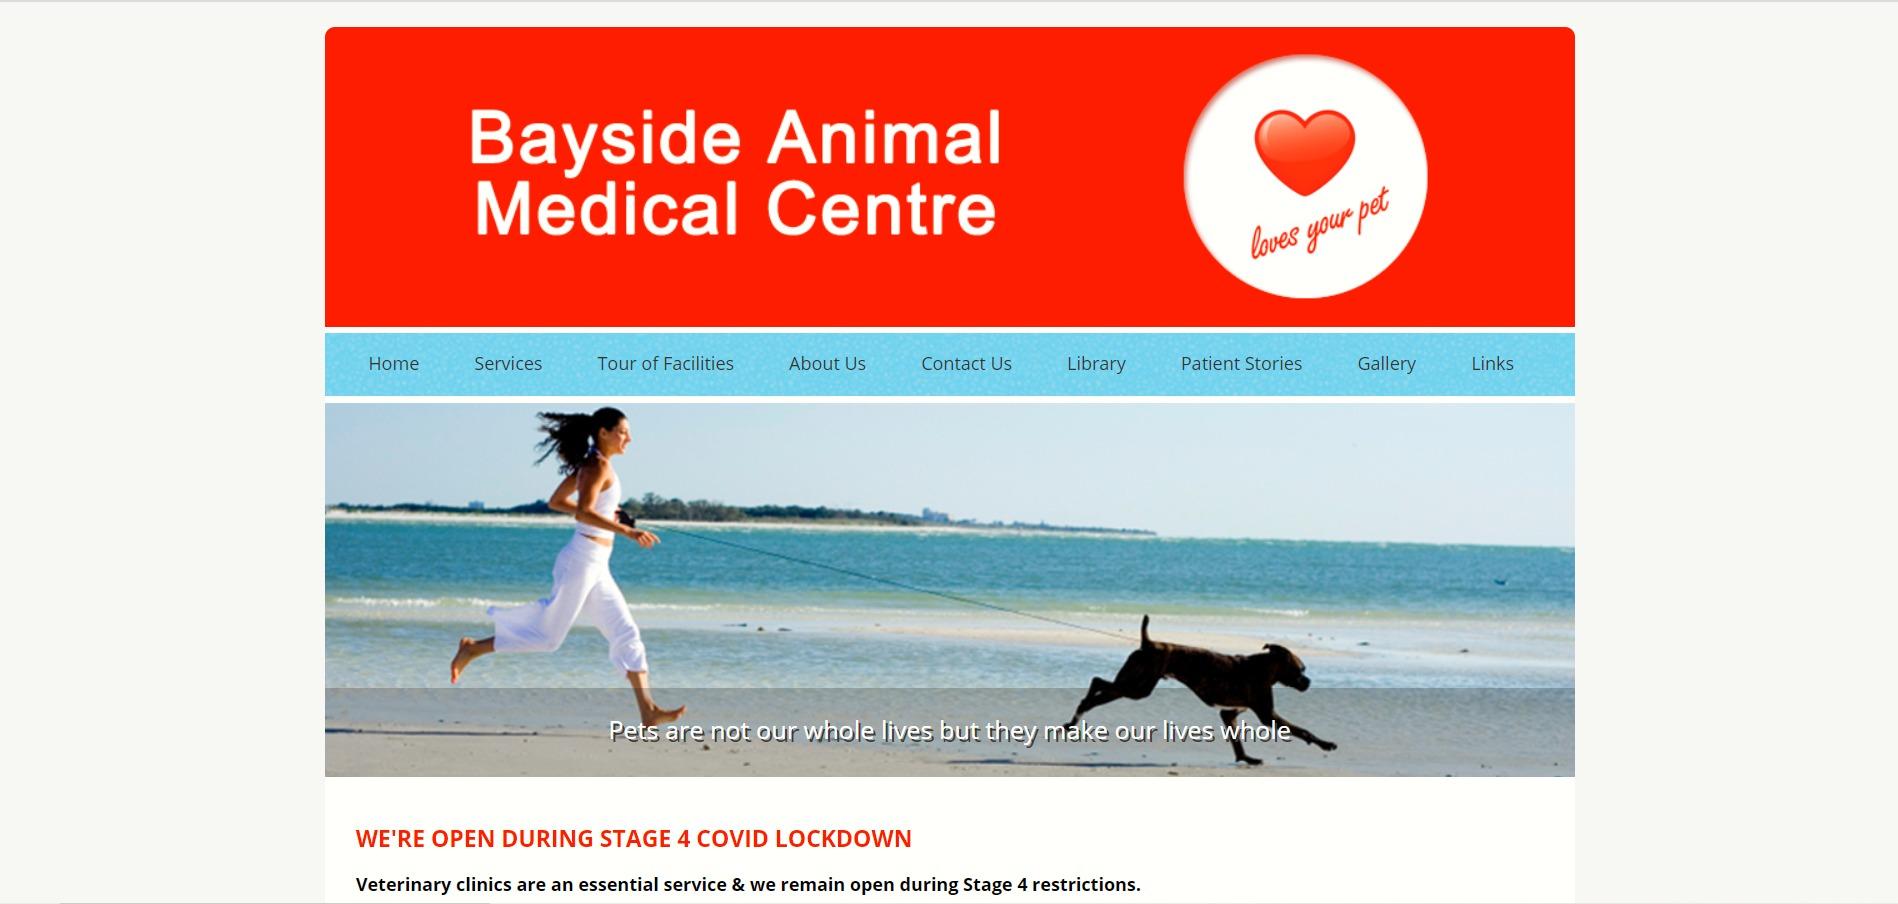 Bayside Animal Medical Centre